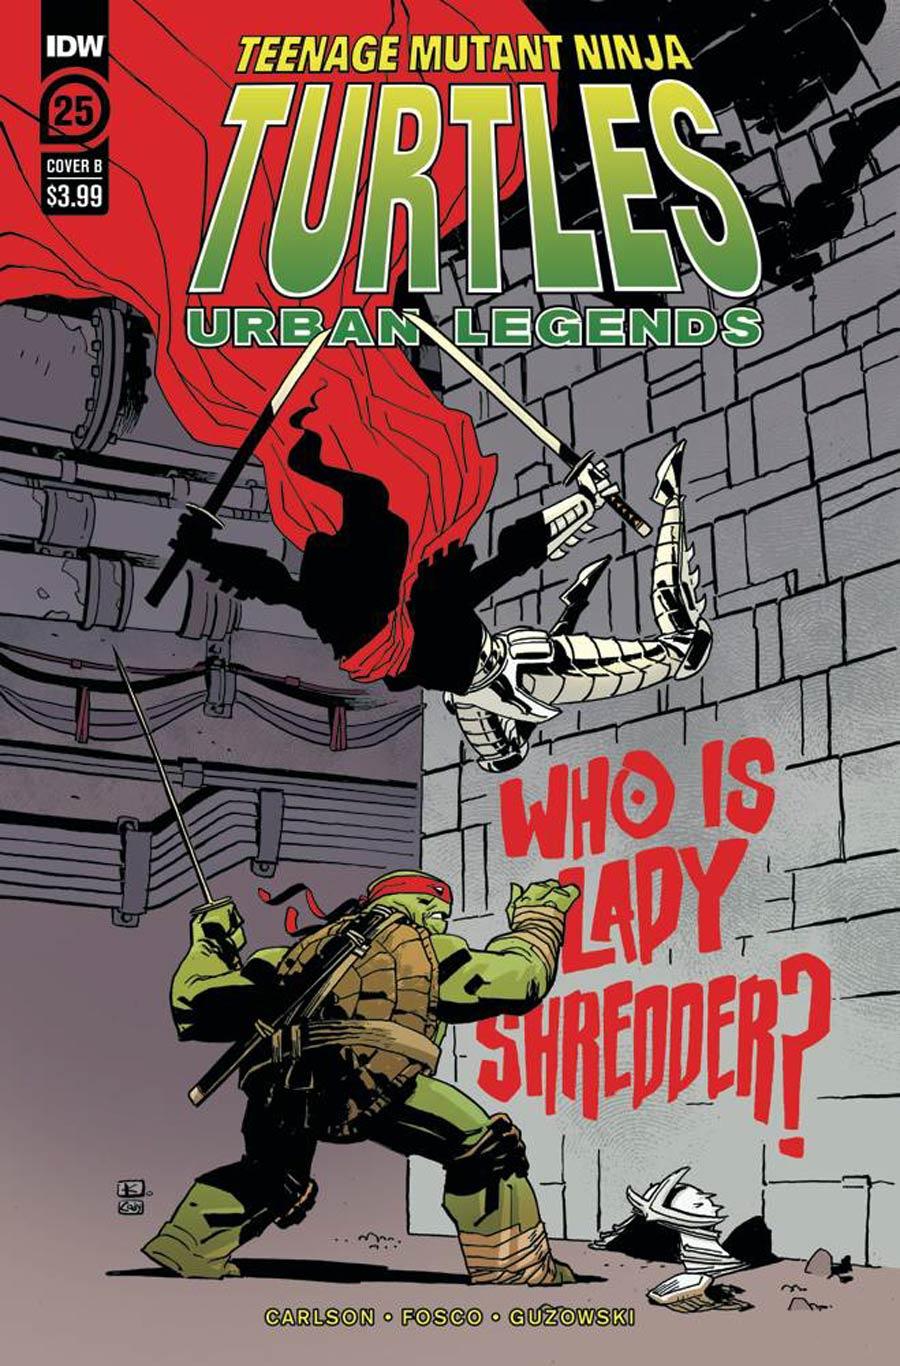 Teenage Mutant Ninja Turtles Urban Legends #25 Cover B Variant Andy Kuhn Cover